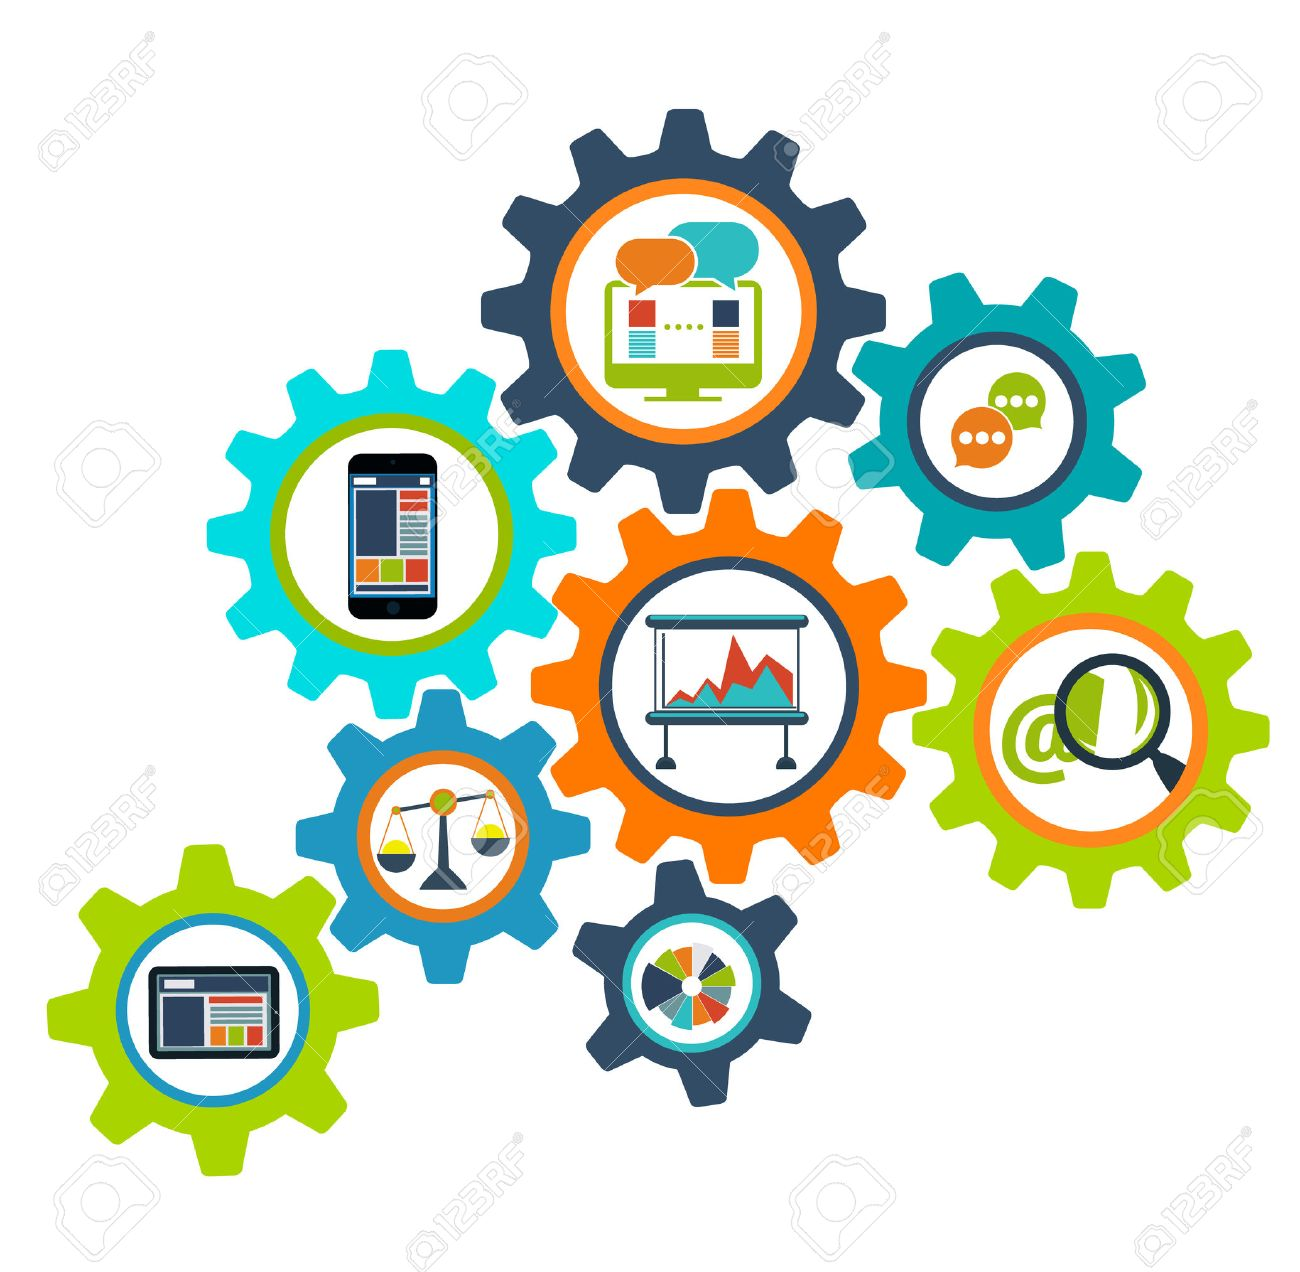 Concept process cogwheel design flat. Process and wheel, cogwheel vector, cog wheels, cogwheel icon, cogwheel gear, mechanism progress process, web communication process mechanical illustration - 52467211